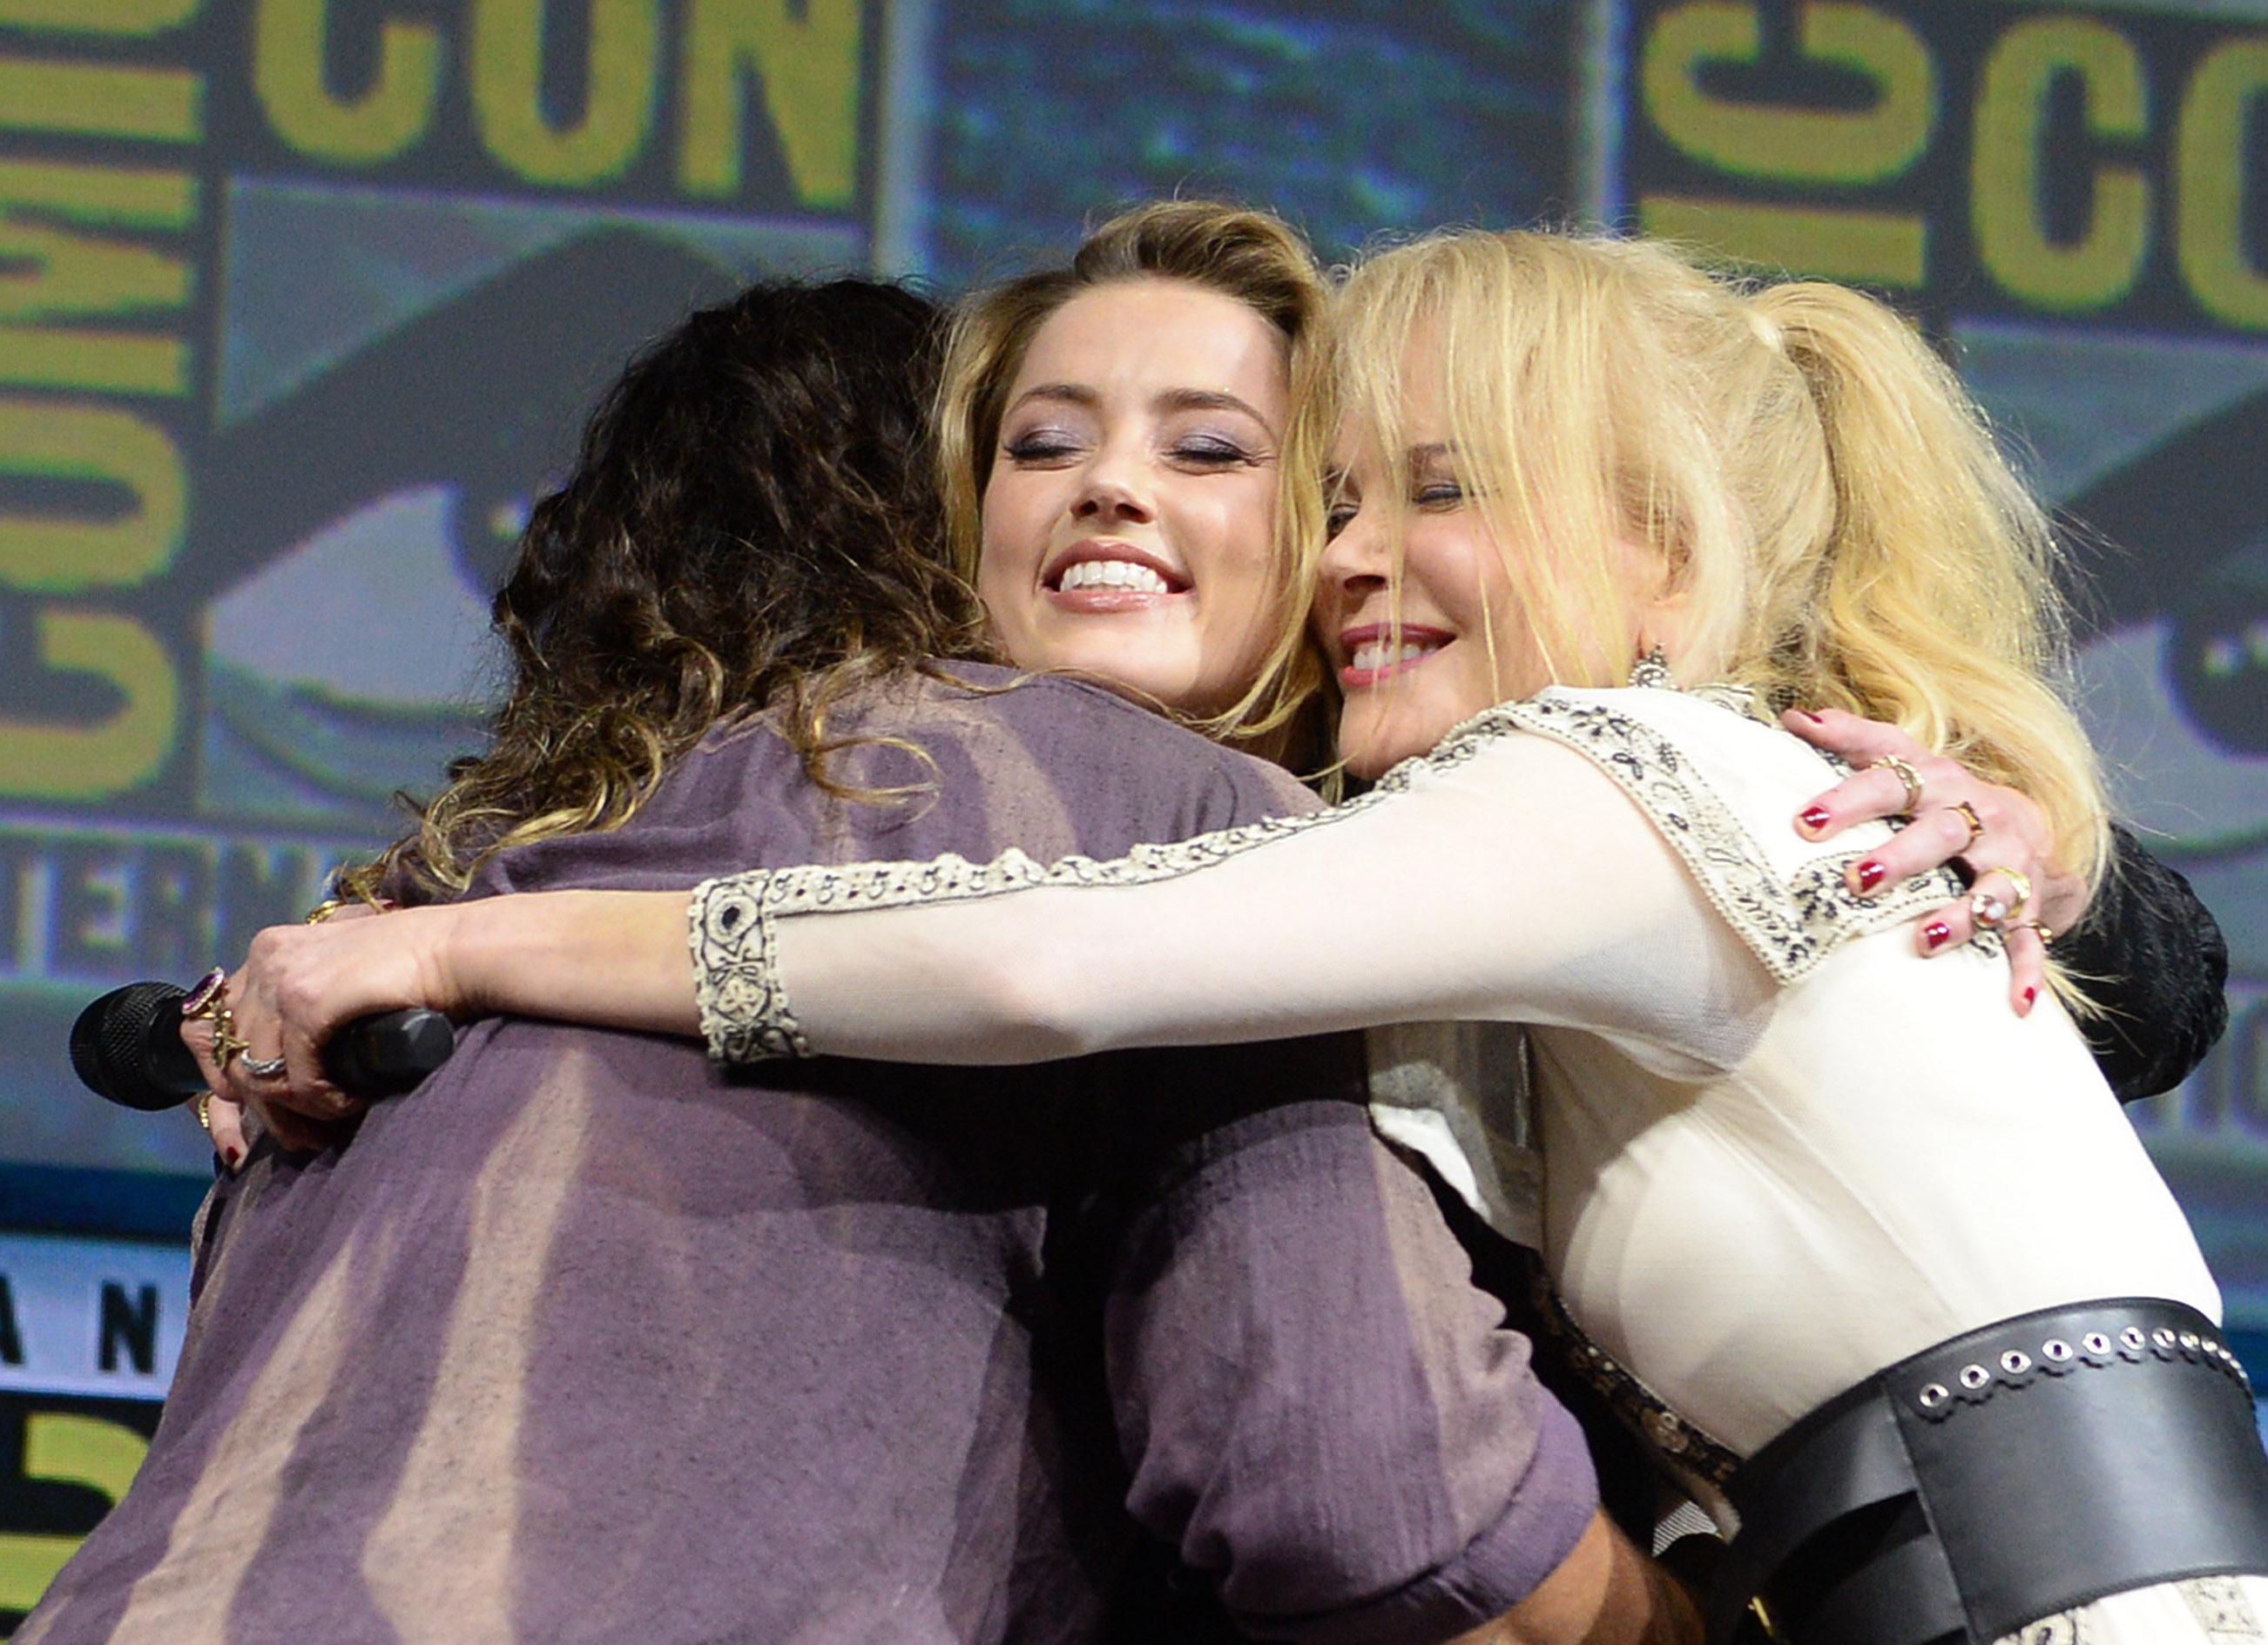 Jason Momoa, Amber Heard and Nicole Kidman'Aquaman' film panel, Comic-Con International, San Diego, USA - 21 Jul 2018 2018 Comic-Con International: San Diego Day 3 - Warner Bros. Studio Panel